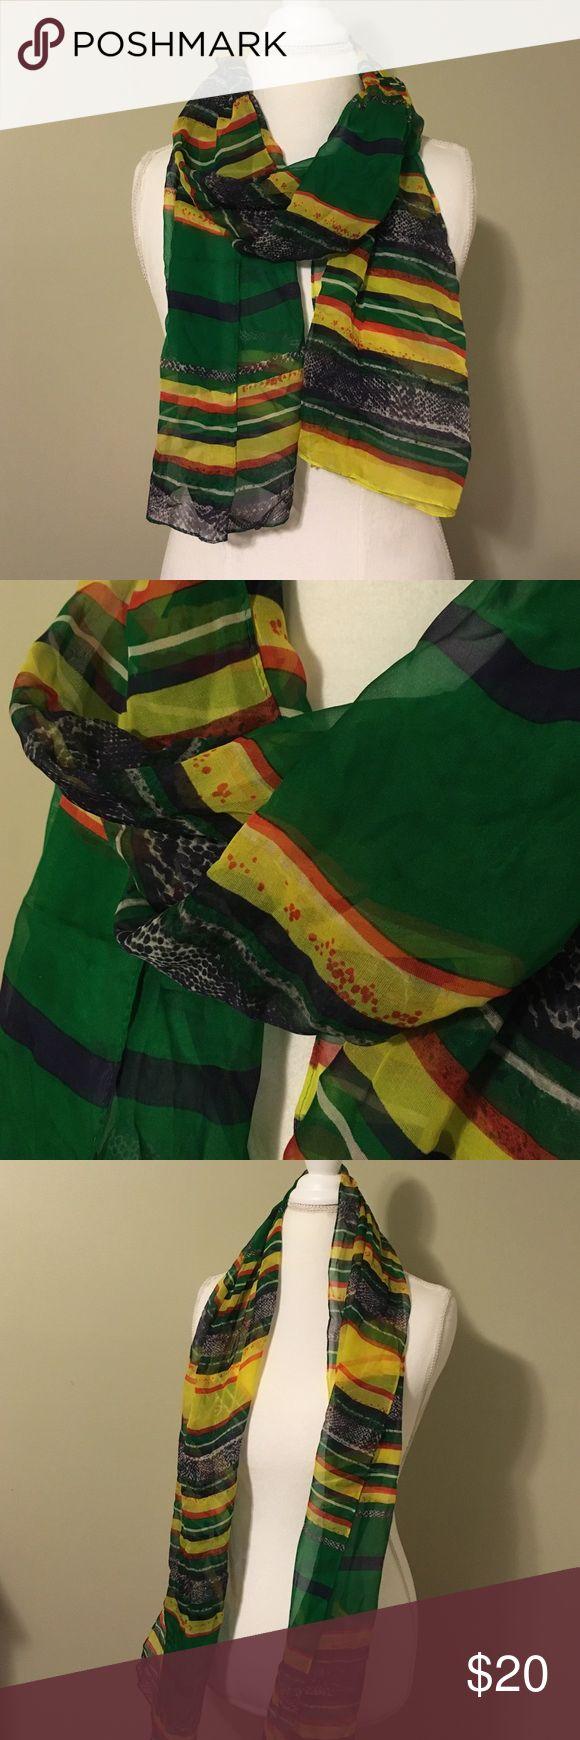 Anne Klein will scarf Beautiful condition silk scar by Anne Klein. Green, cream, yellow, red, and snakeskin stripes. Anne Klein Accessories Scarves & Wraps